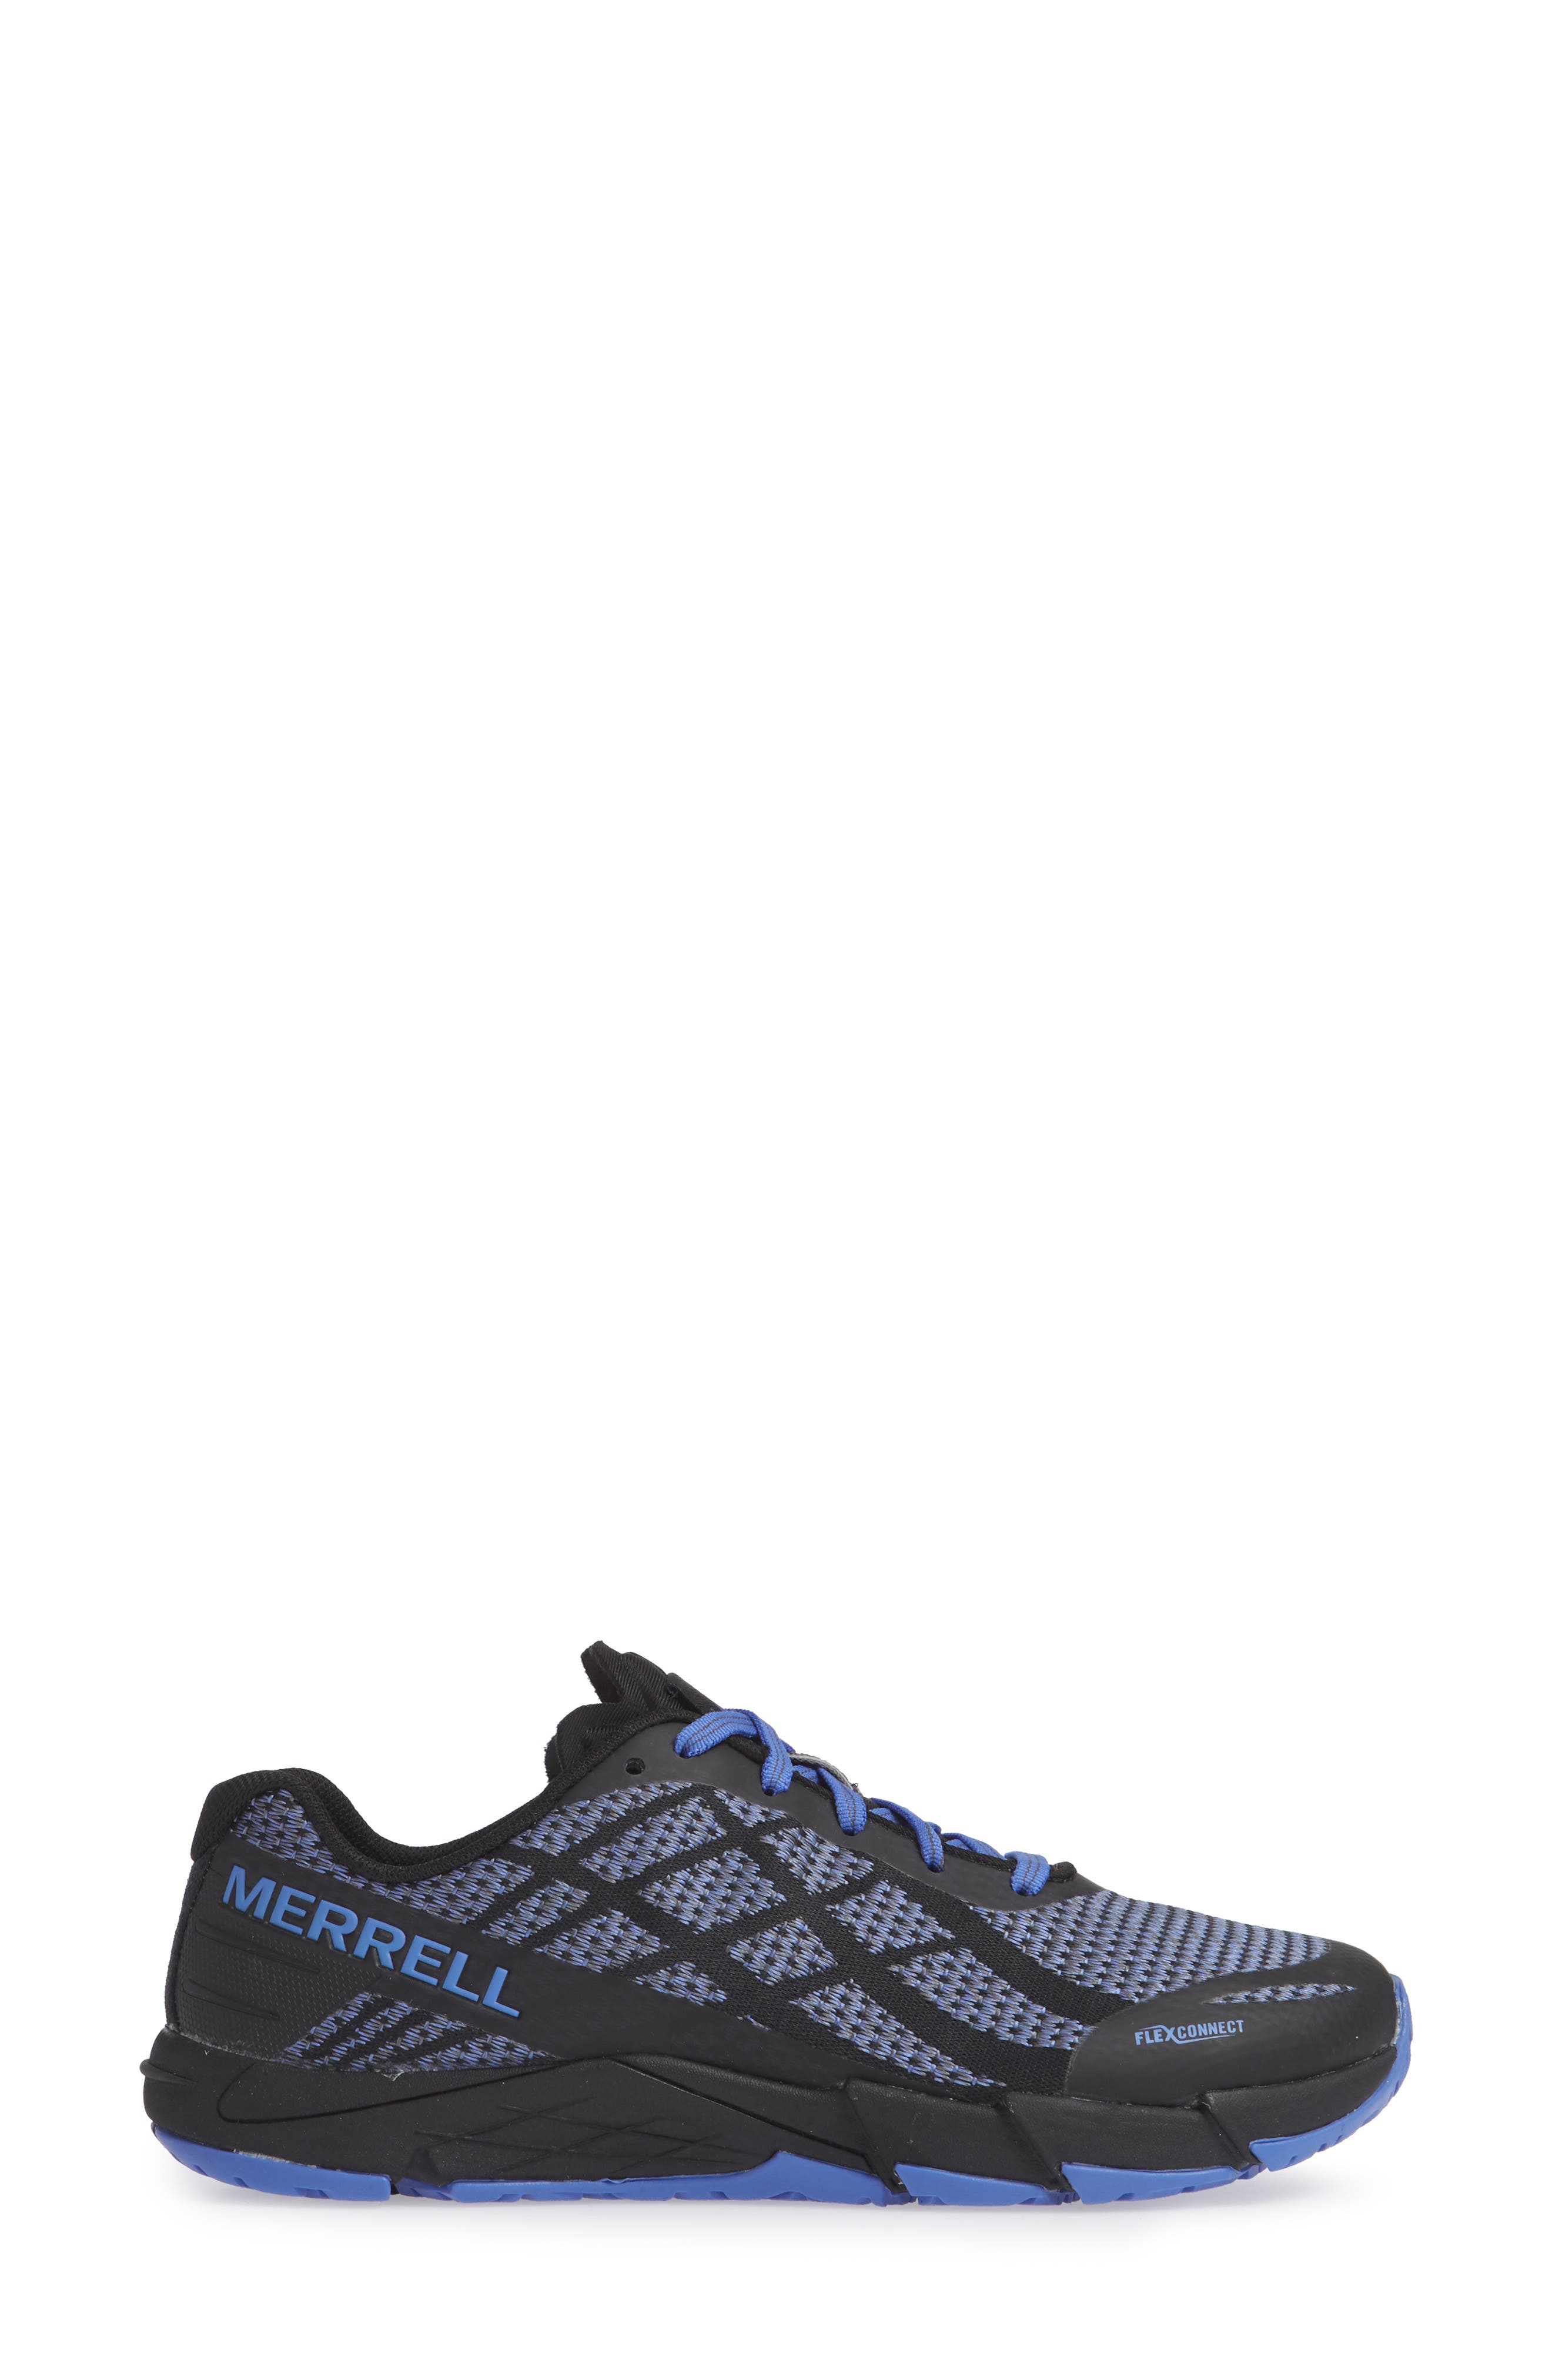 MERRELL, Bare Access Flex Shield Lace-Up Sneaker, Alternate thumbnail 3, color, 001